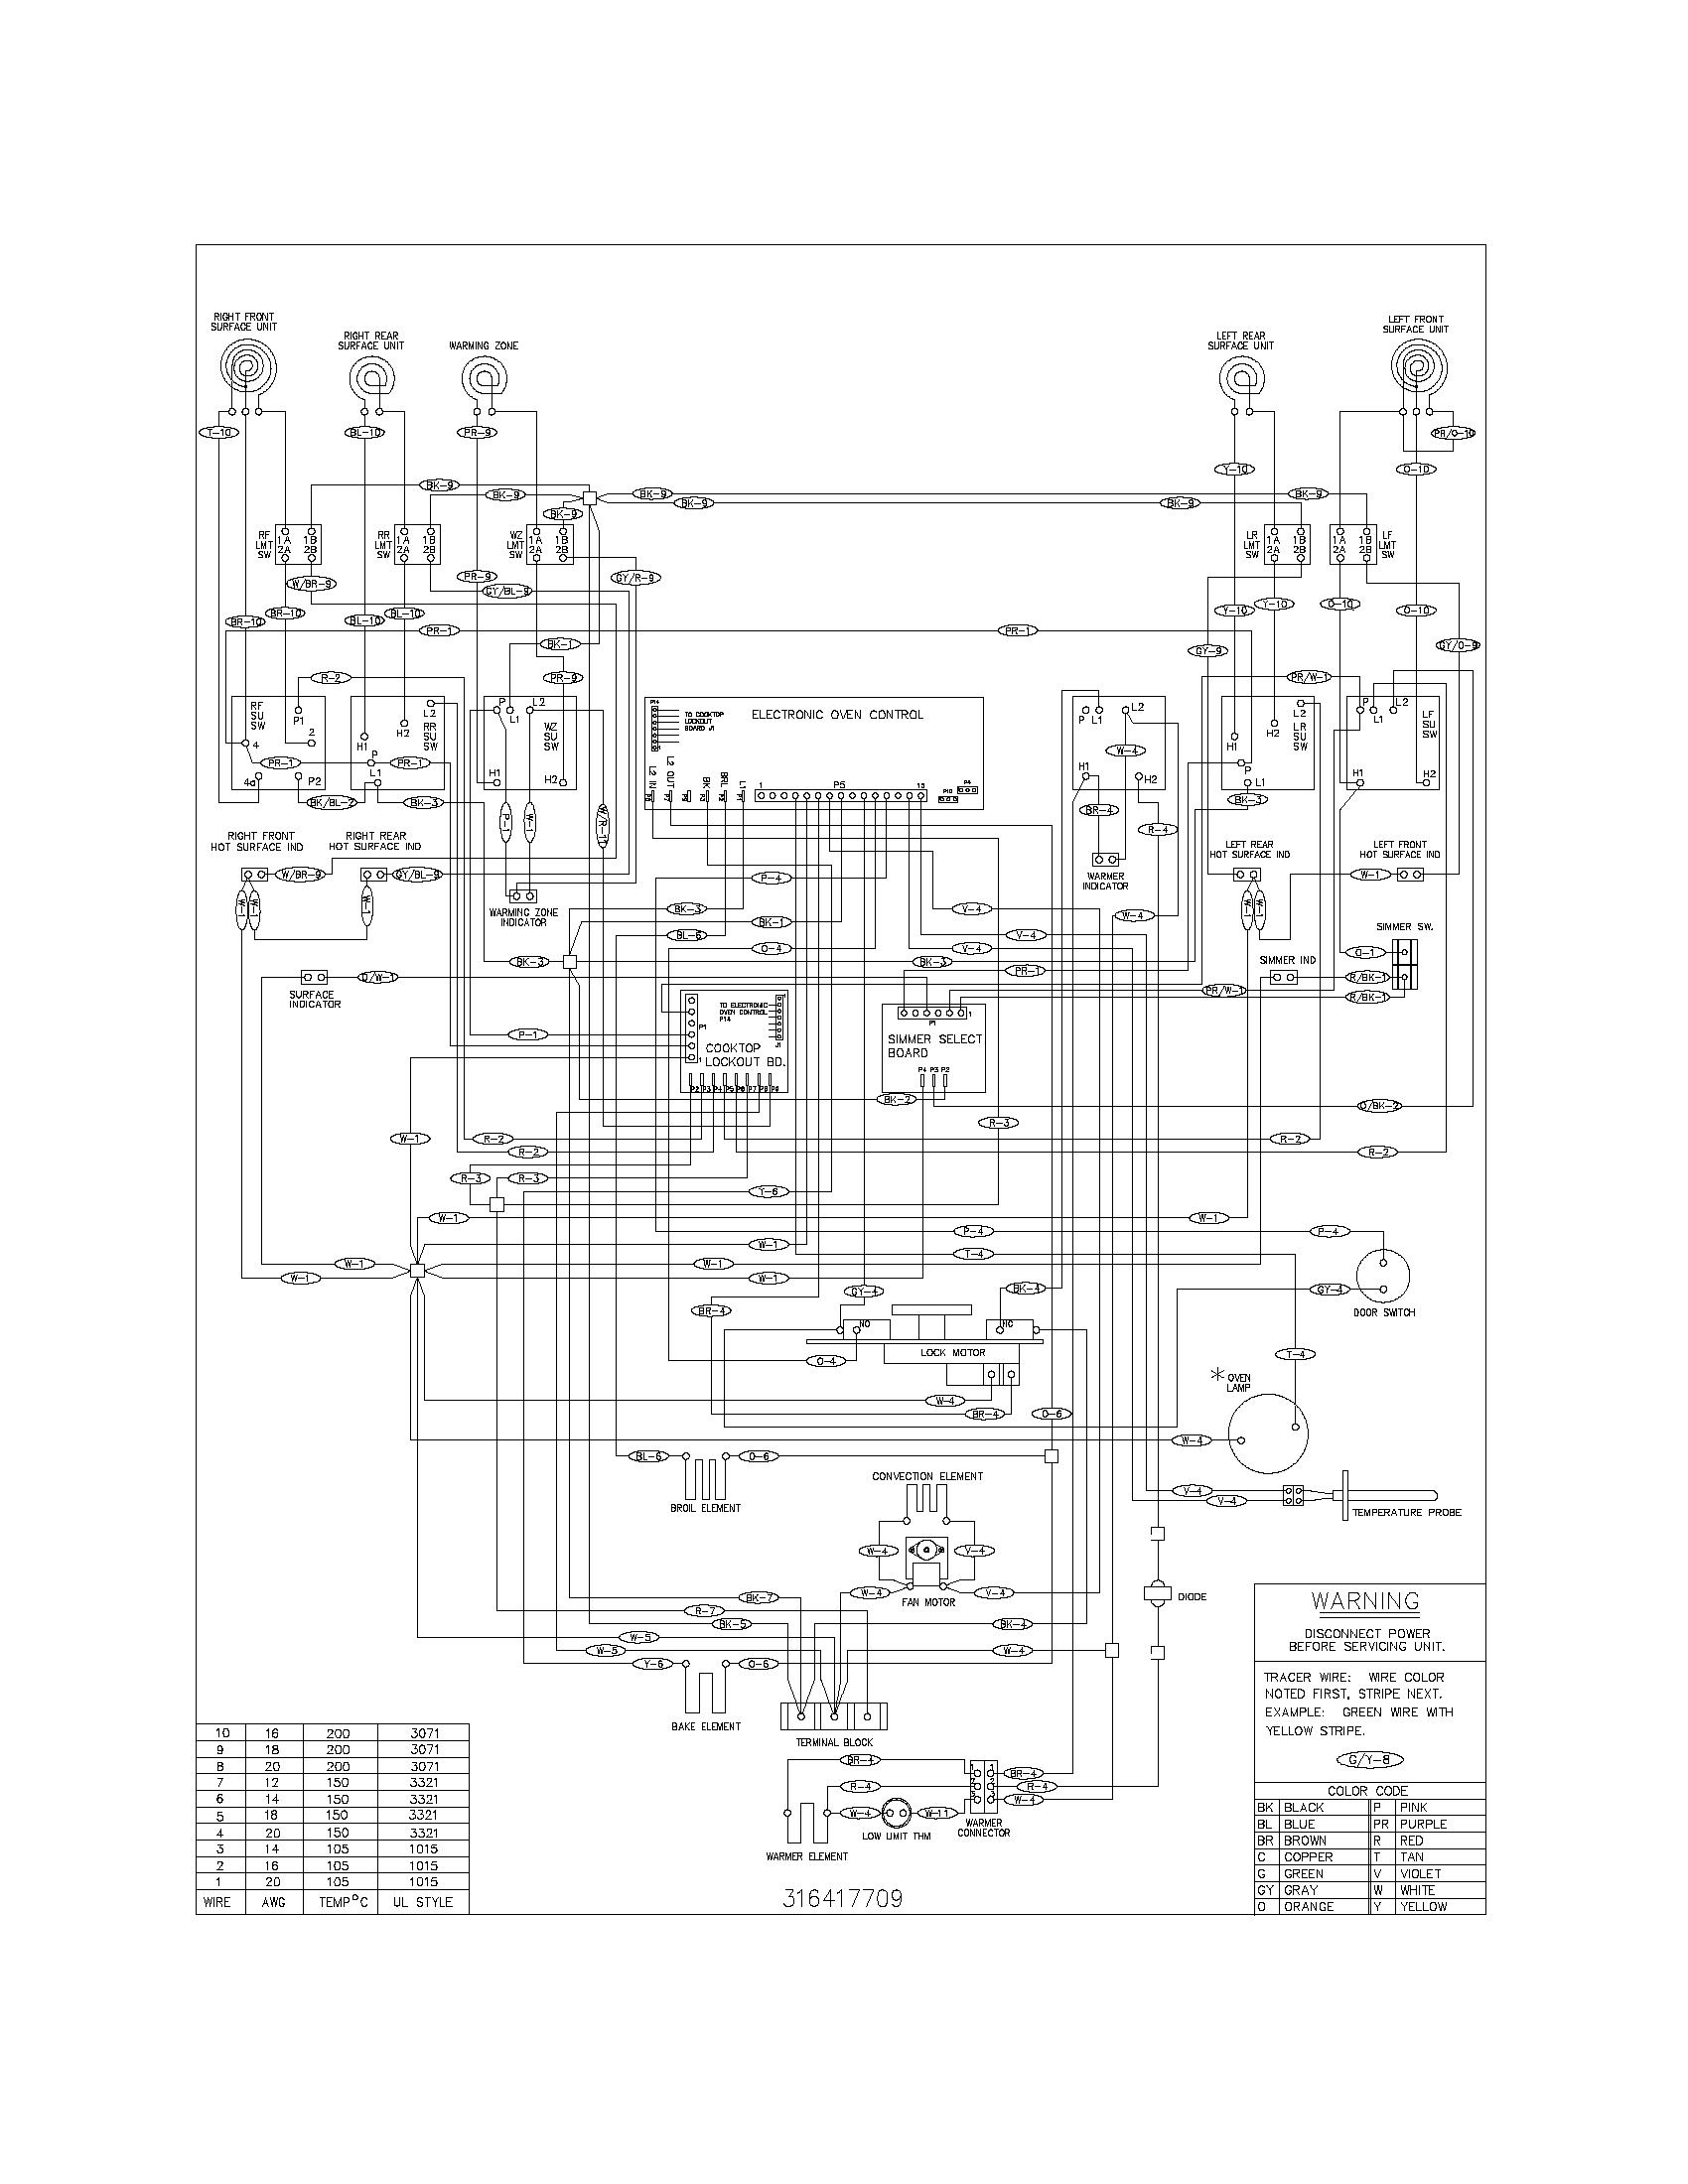 Maytag Mde26csacw Wiring Diagrammde Diagram Parts List For Model Mde2400ayw Maytagparts Dryerparts Partsresize